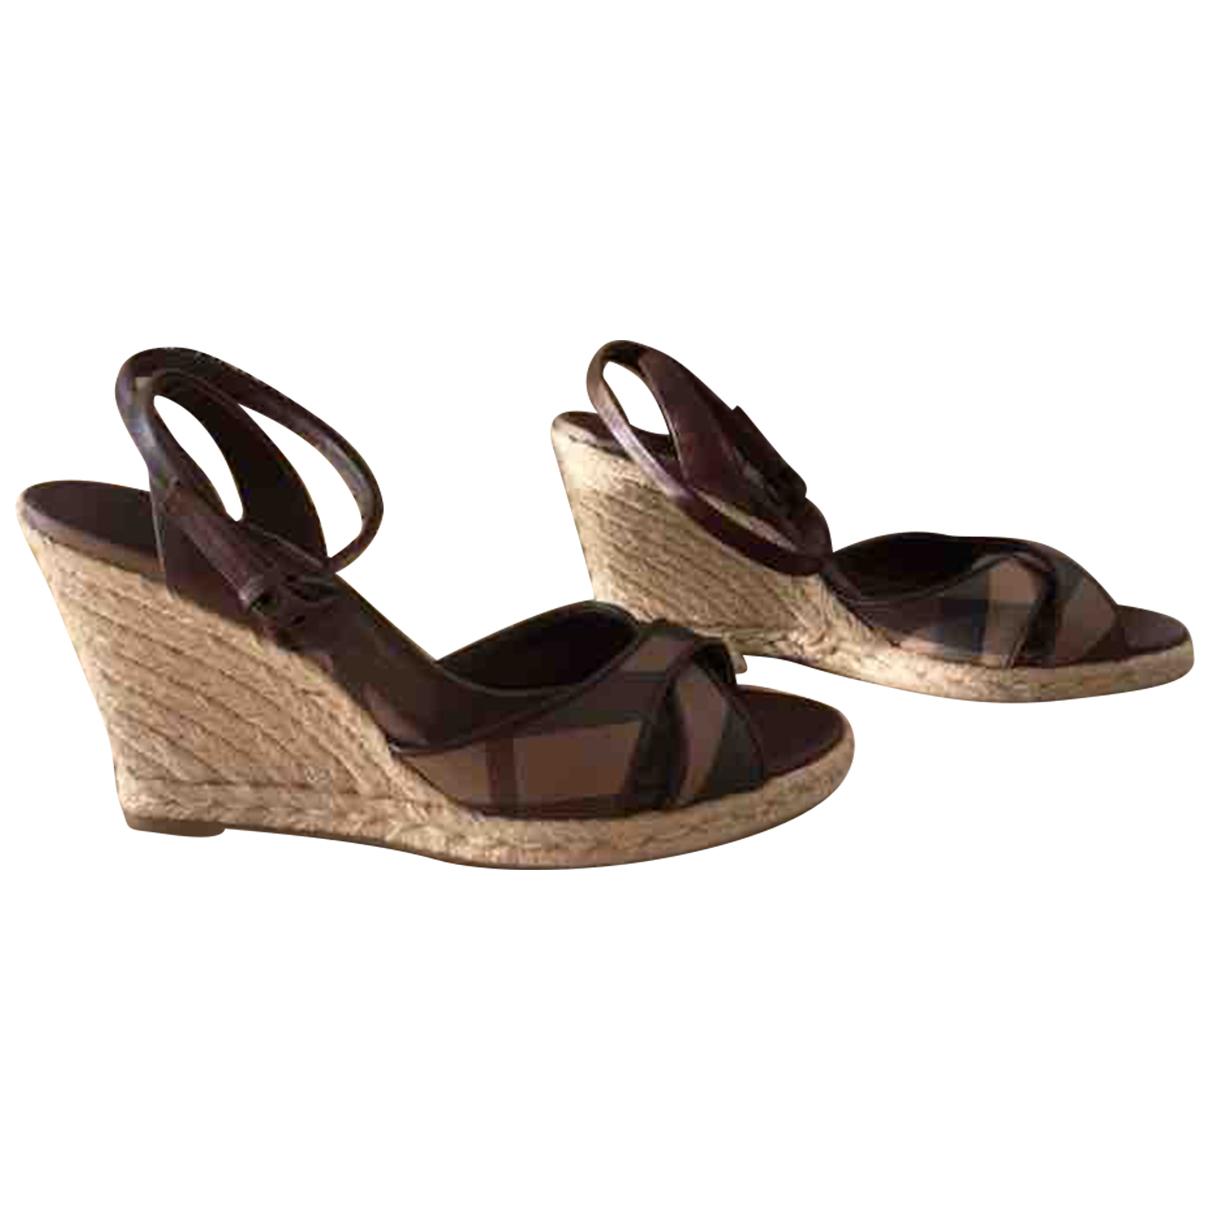 Burberry \N Beige Sandals for Women 39 EU